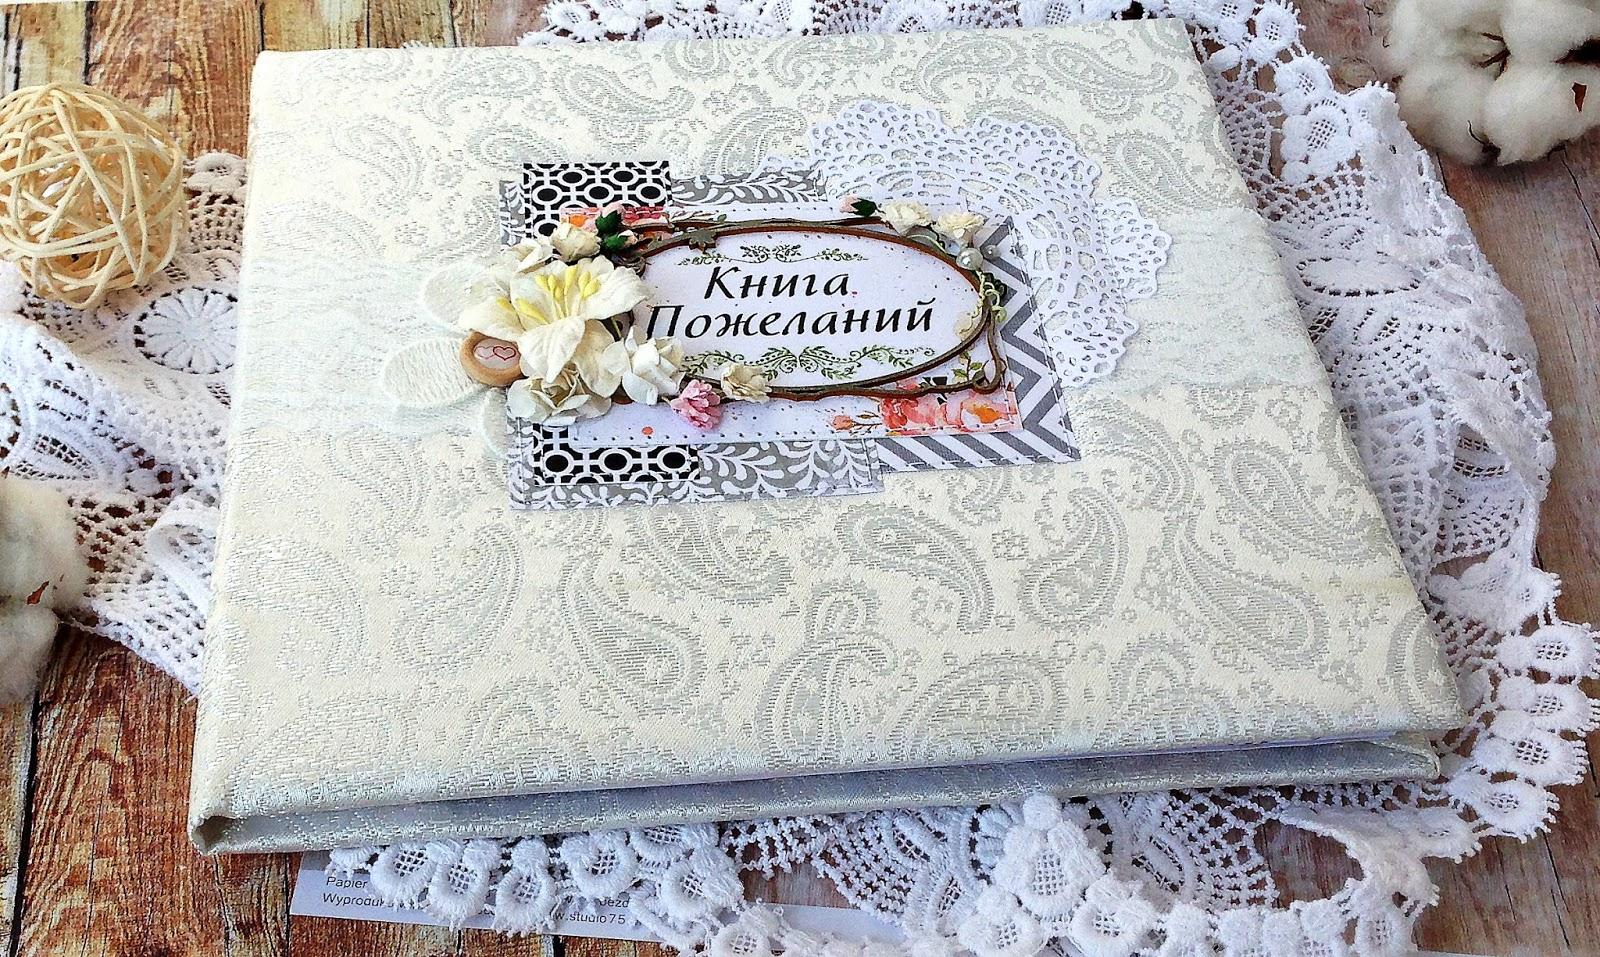 Книги пожеланий на свадьбу в минске